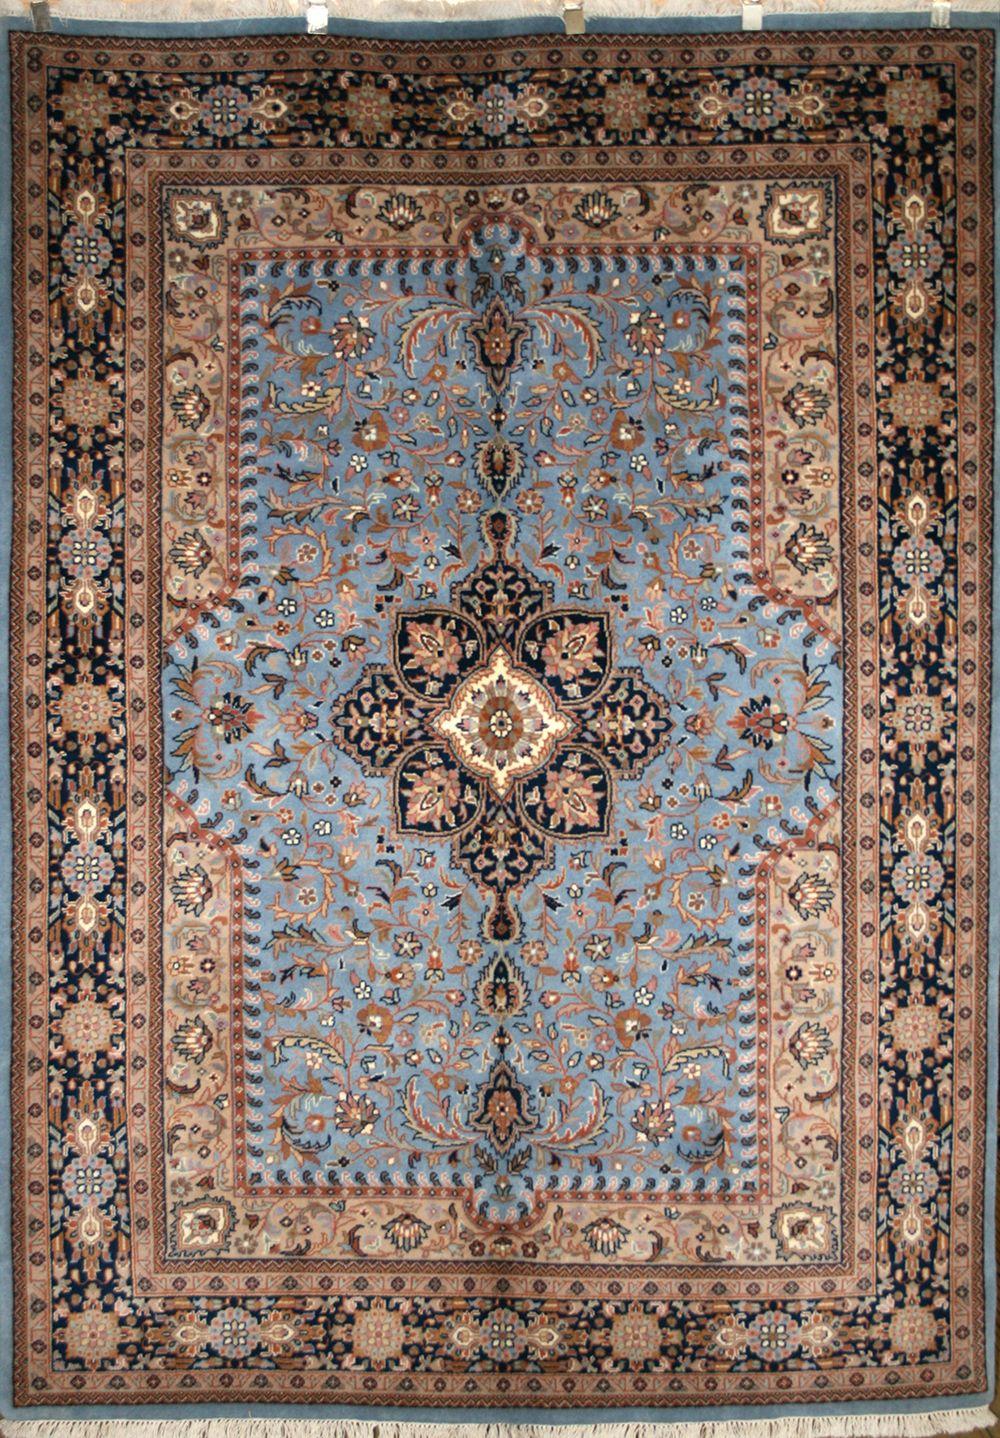 Kerman Rug Rugs On Carpet Kerman Rugs Carpet Fabric